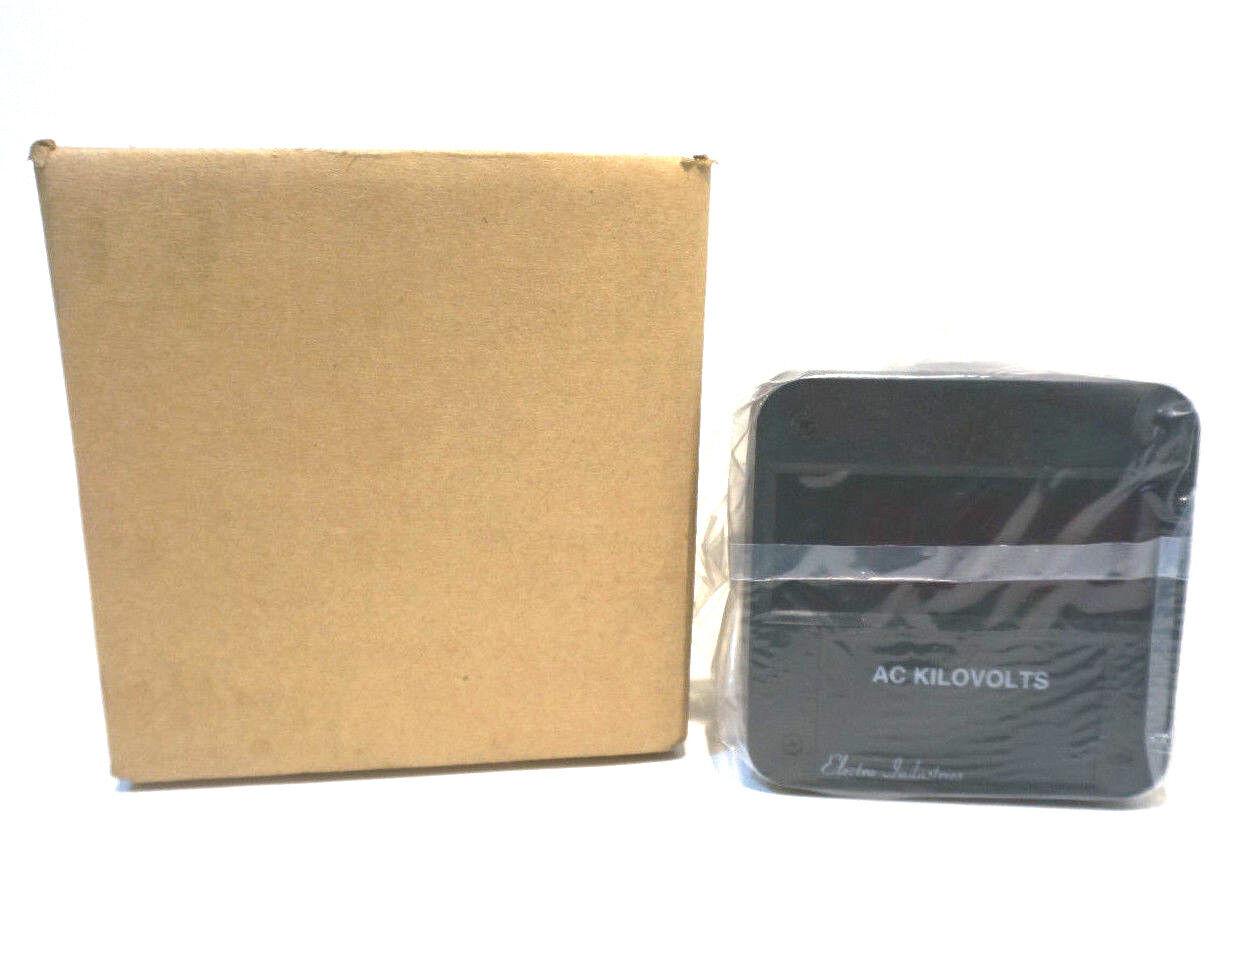 NEW ELECTRO INDUSTRIES FVA120-D2 DIGITAL METER FVA120D2